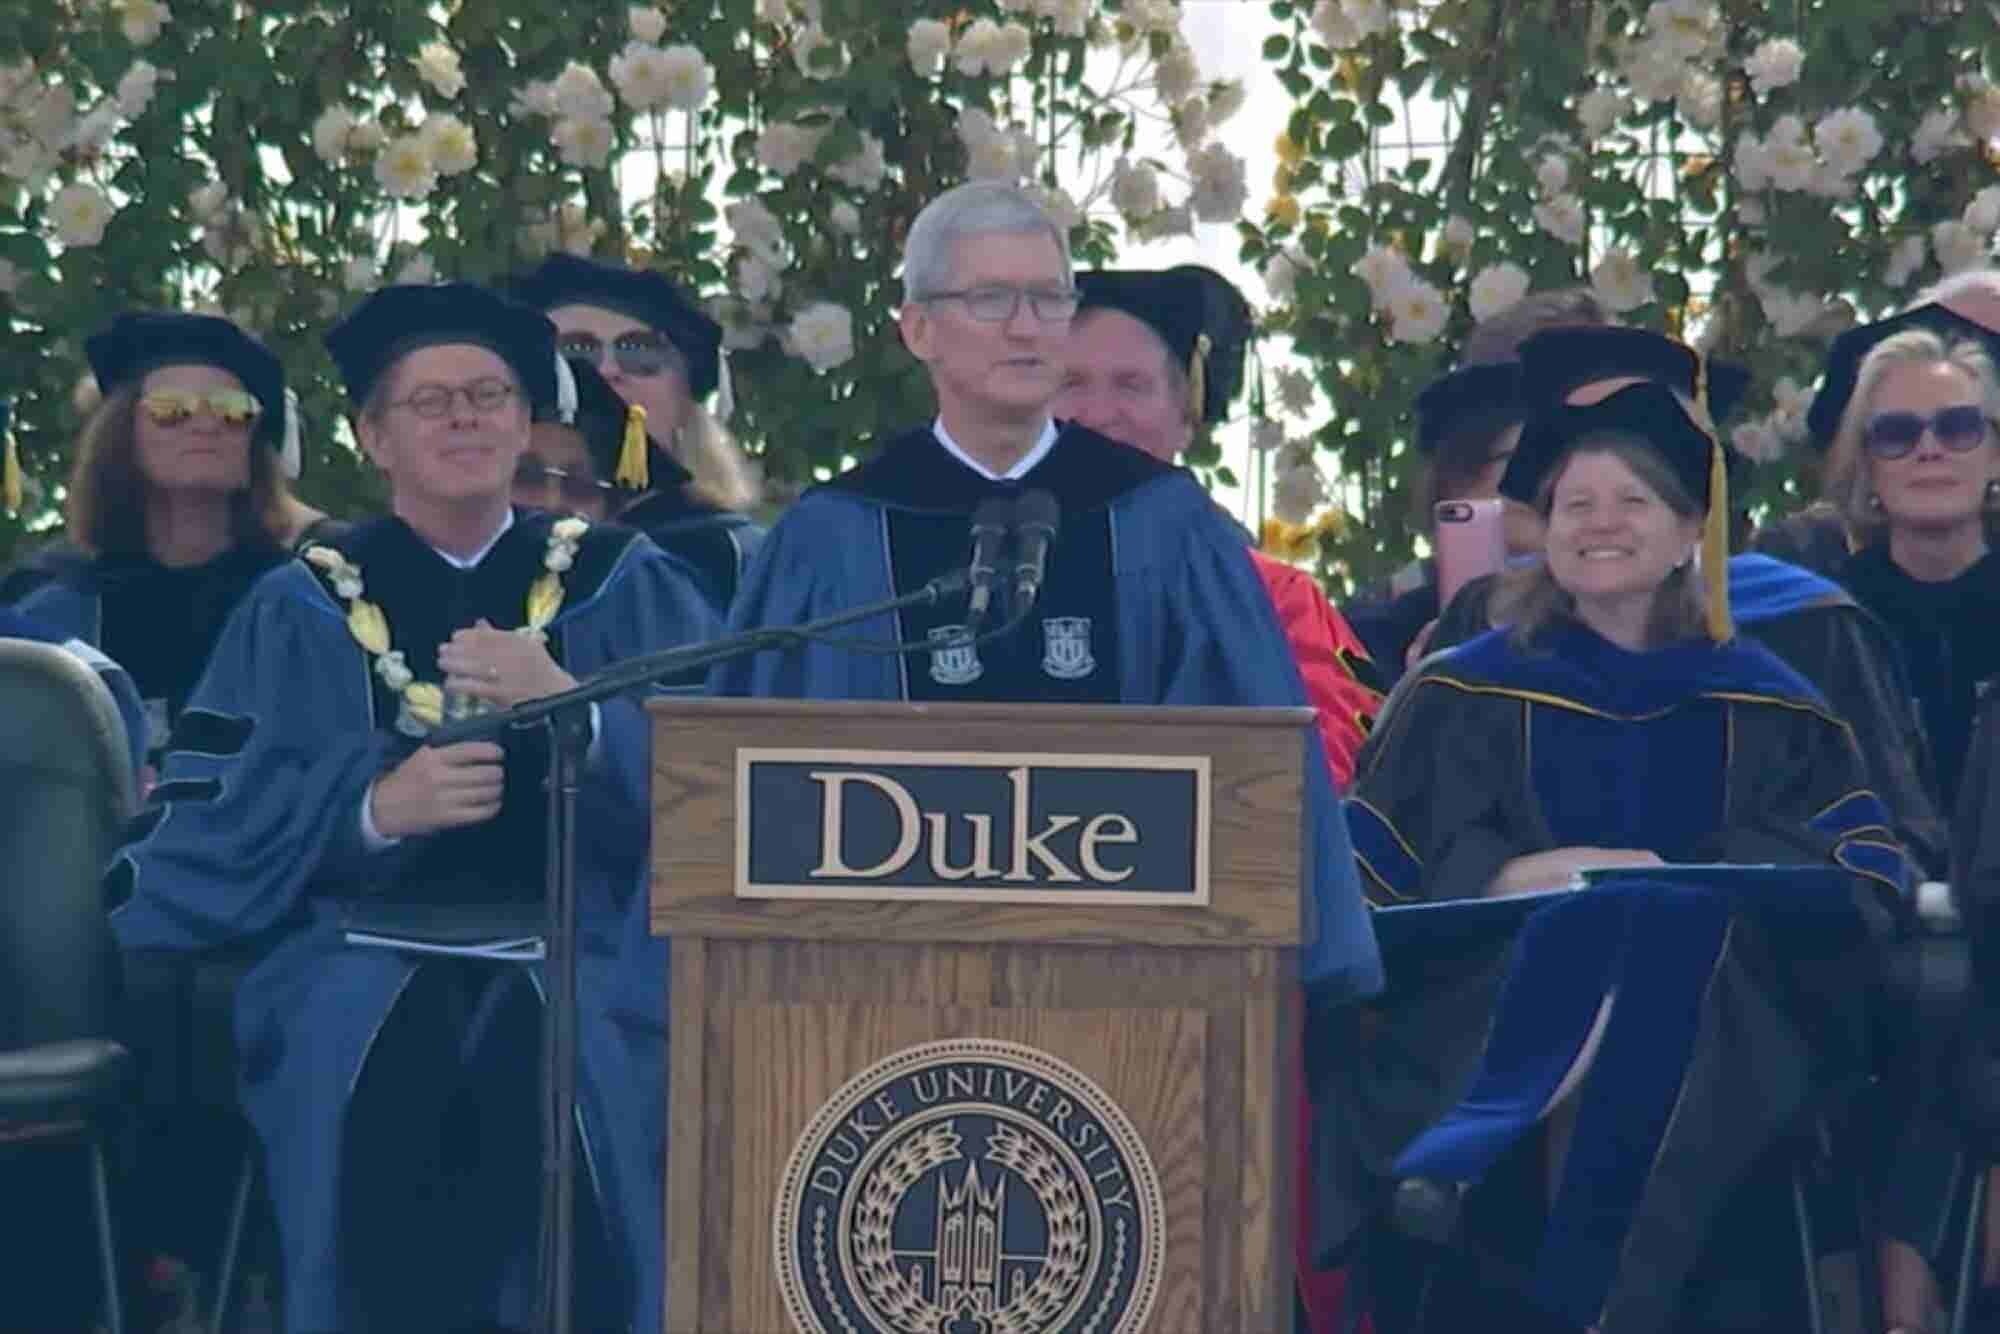 Get Inspired By Tim Cook's 2018 Duke University Commencement Speech